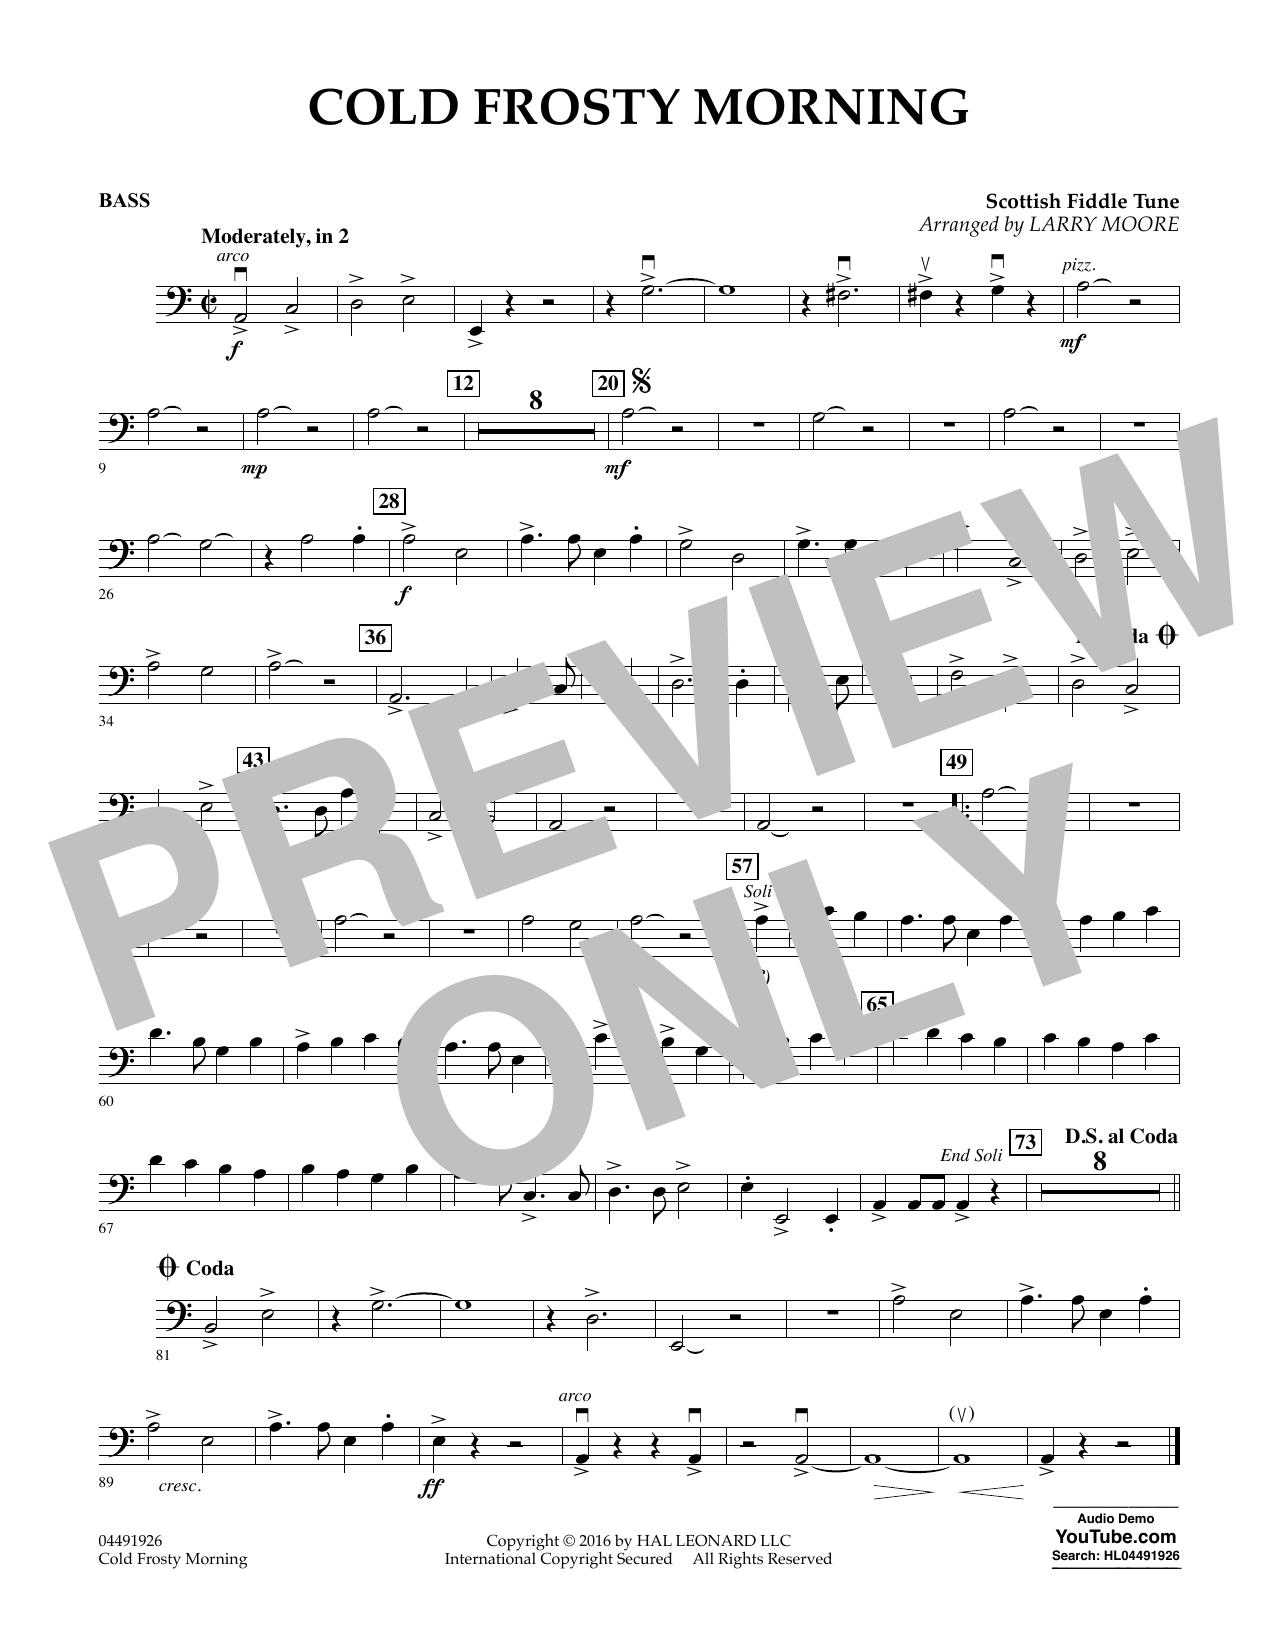 Cold Frosty Morning - Bass Sheet Music